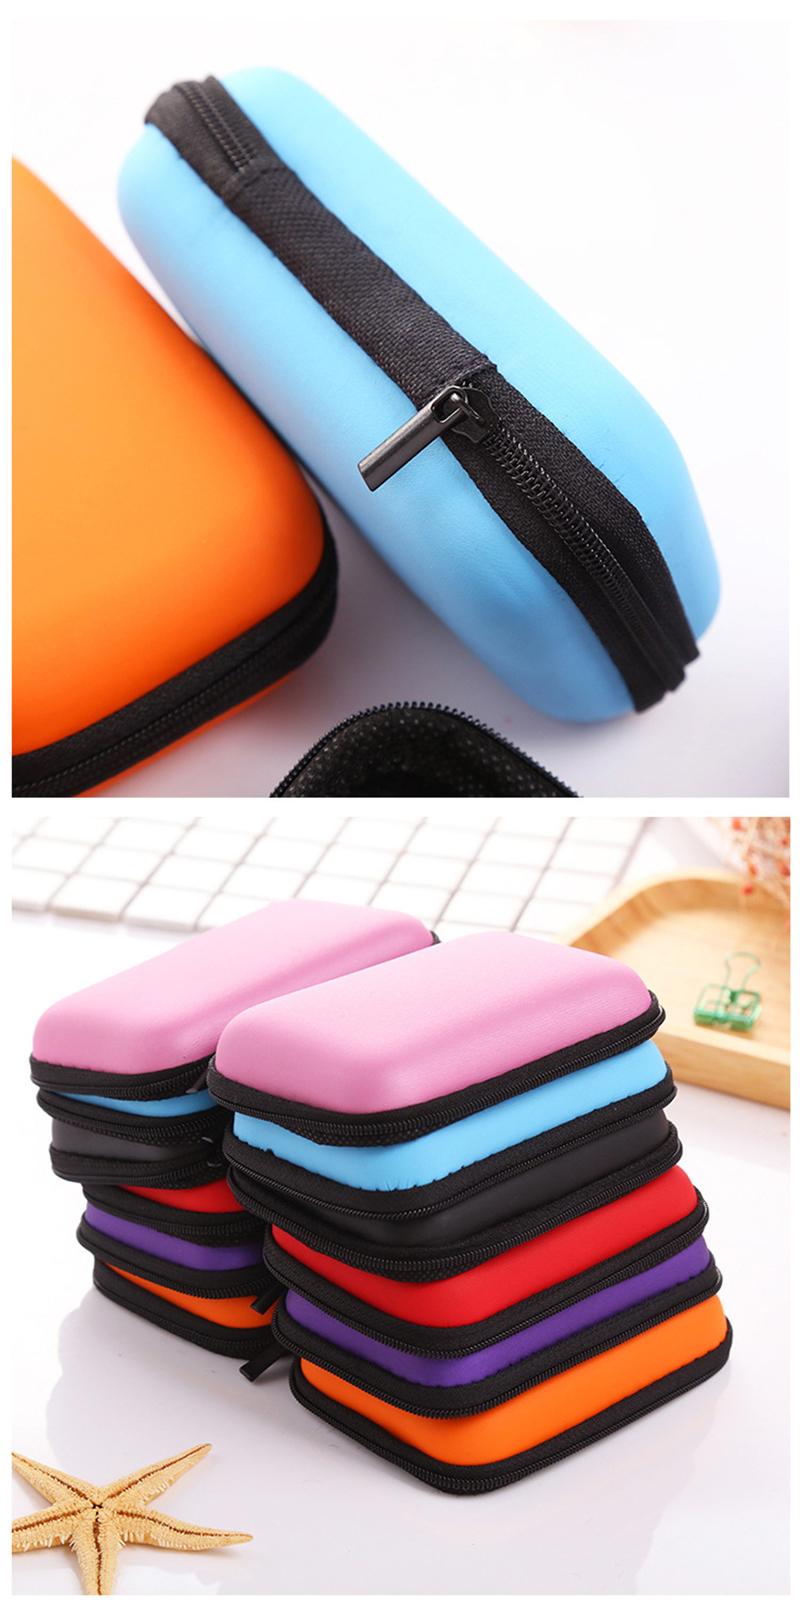 prativerdi Zippered Lock Hard Earphone Case EVA Leather Headphone Storage Bag Protective Usb Cable Portable travel Organizer7